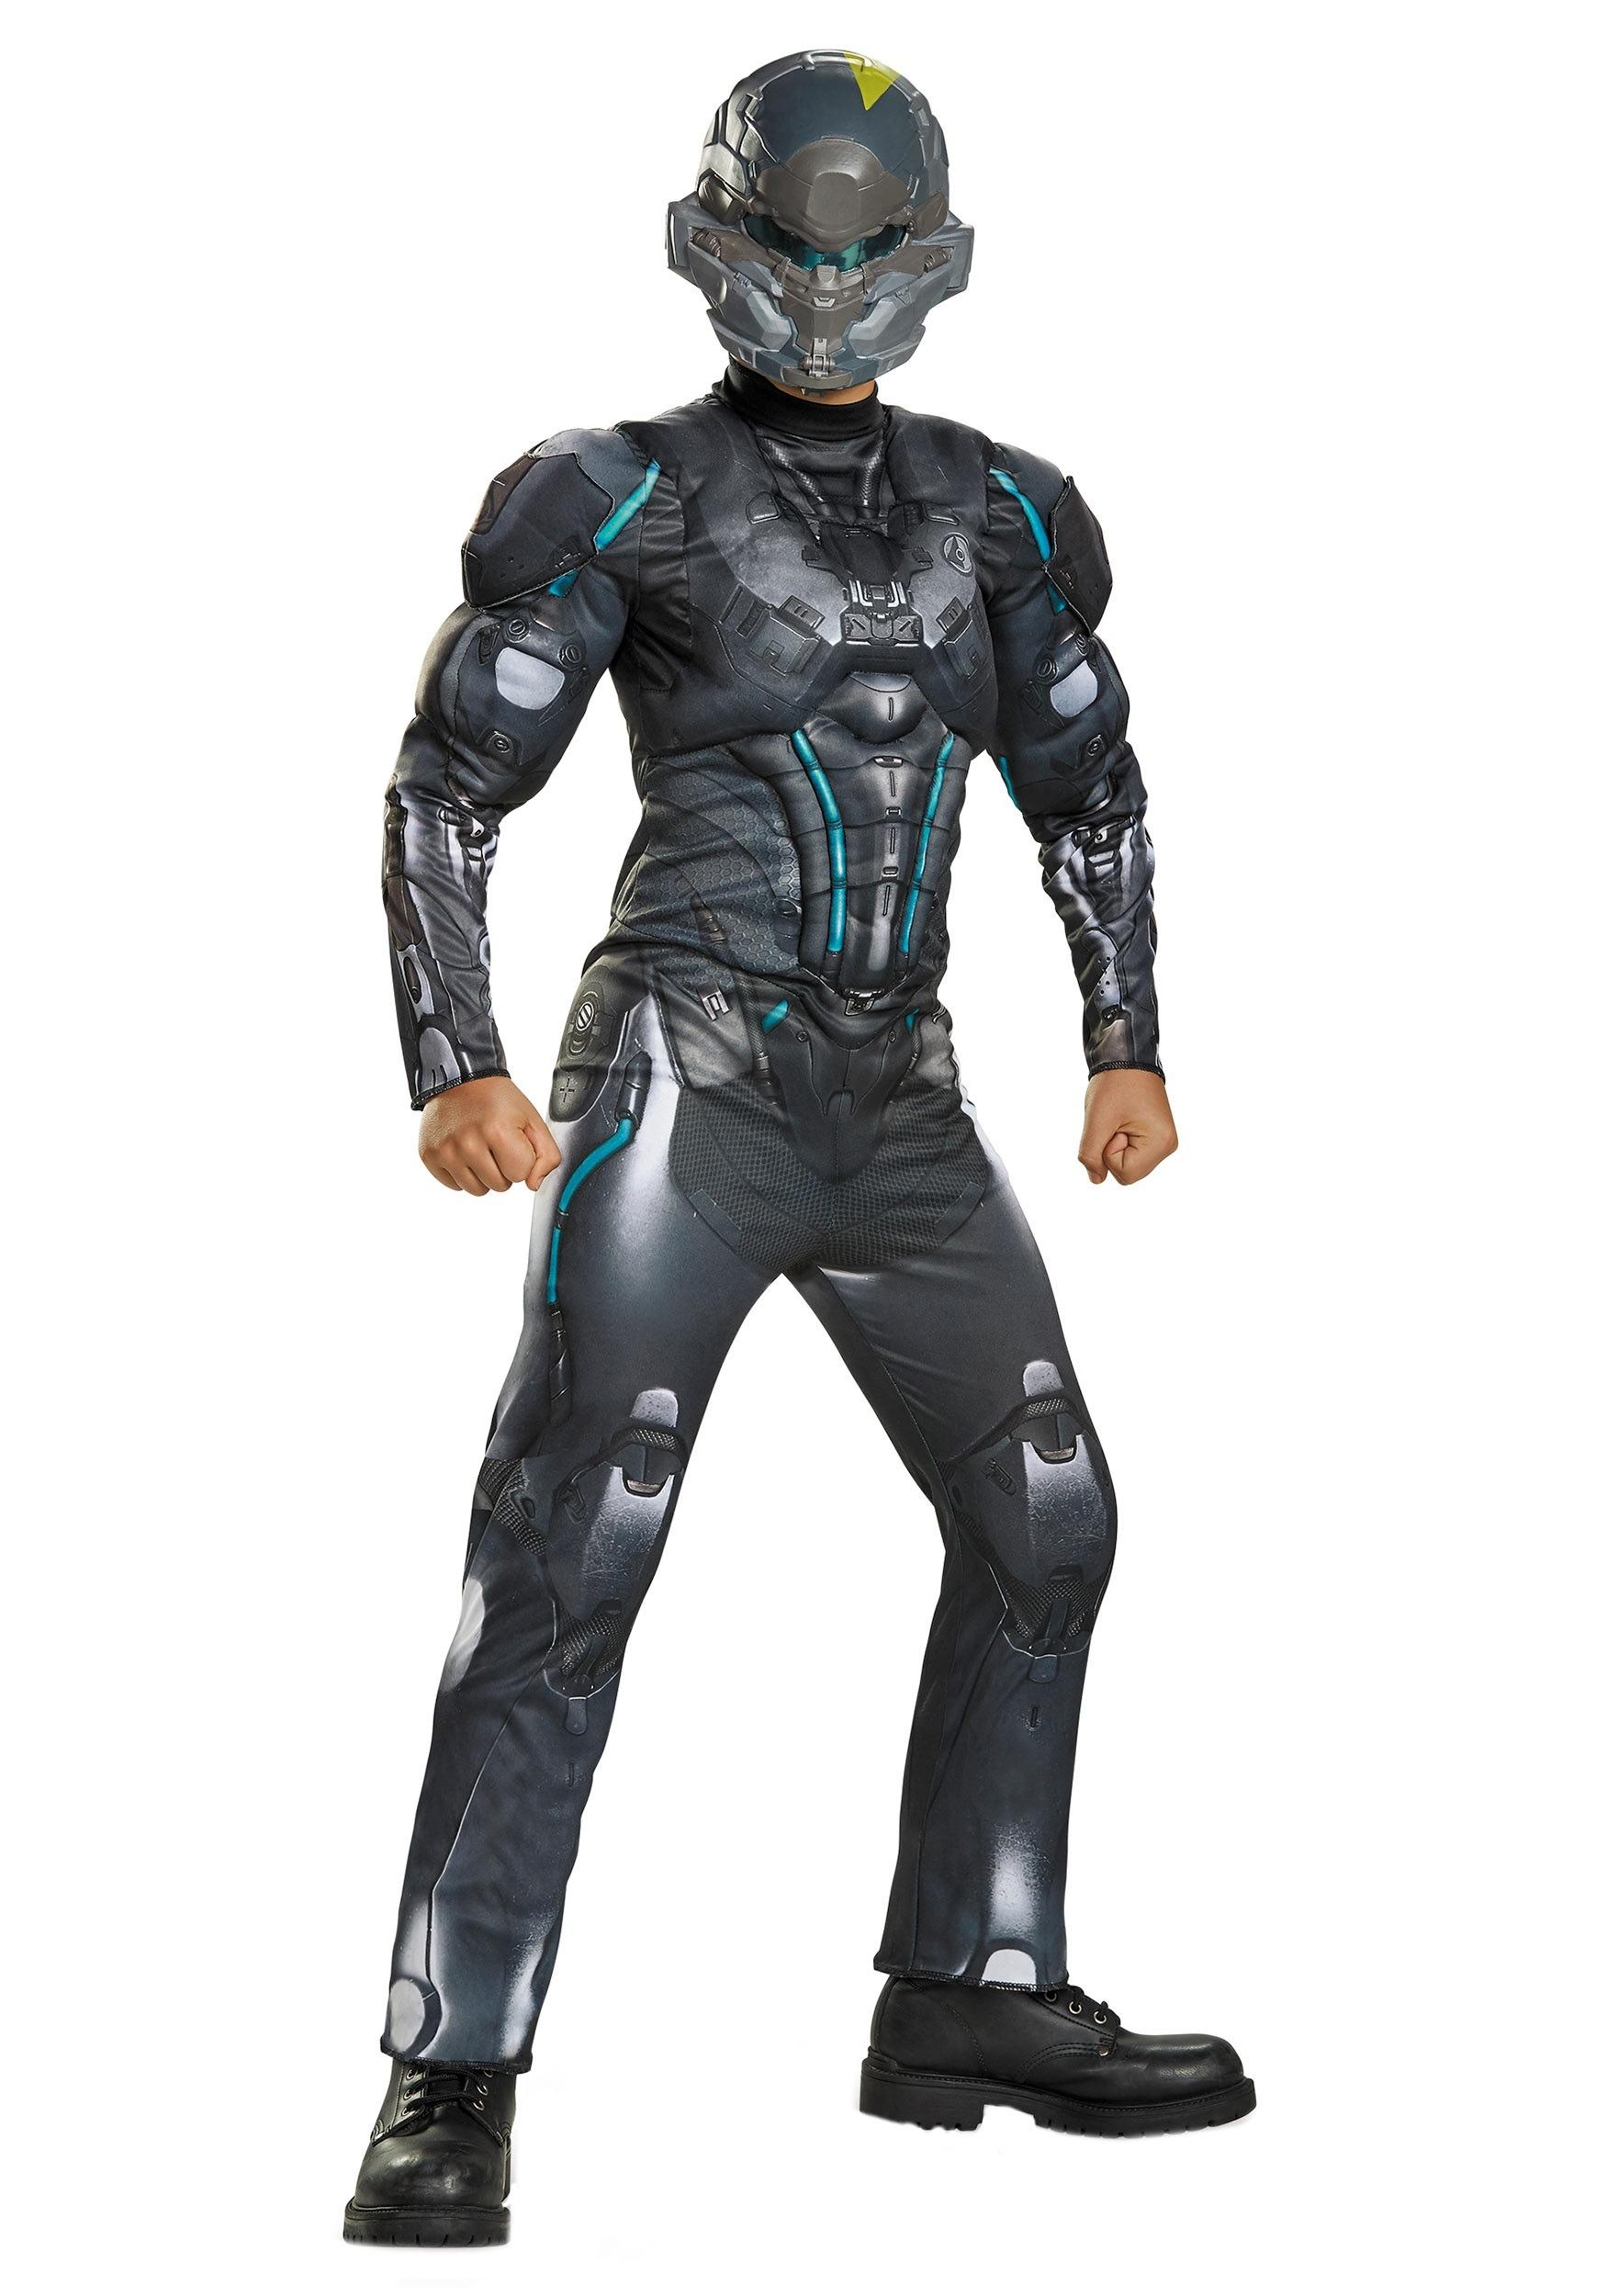 Child Halo Spartan Locke Muscle Chest Costume